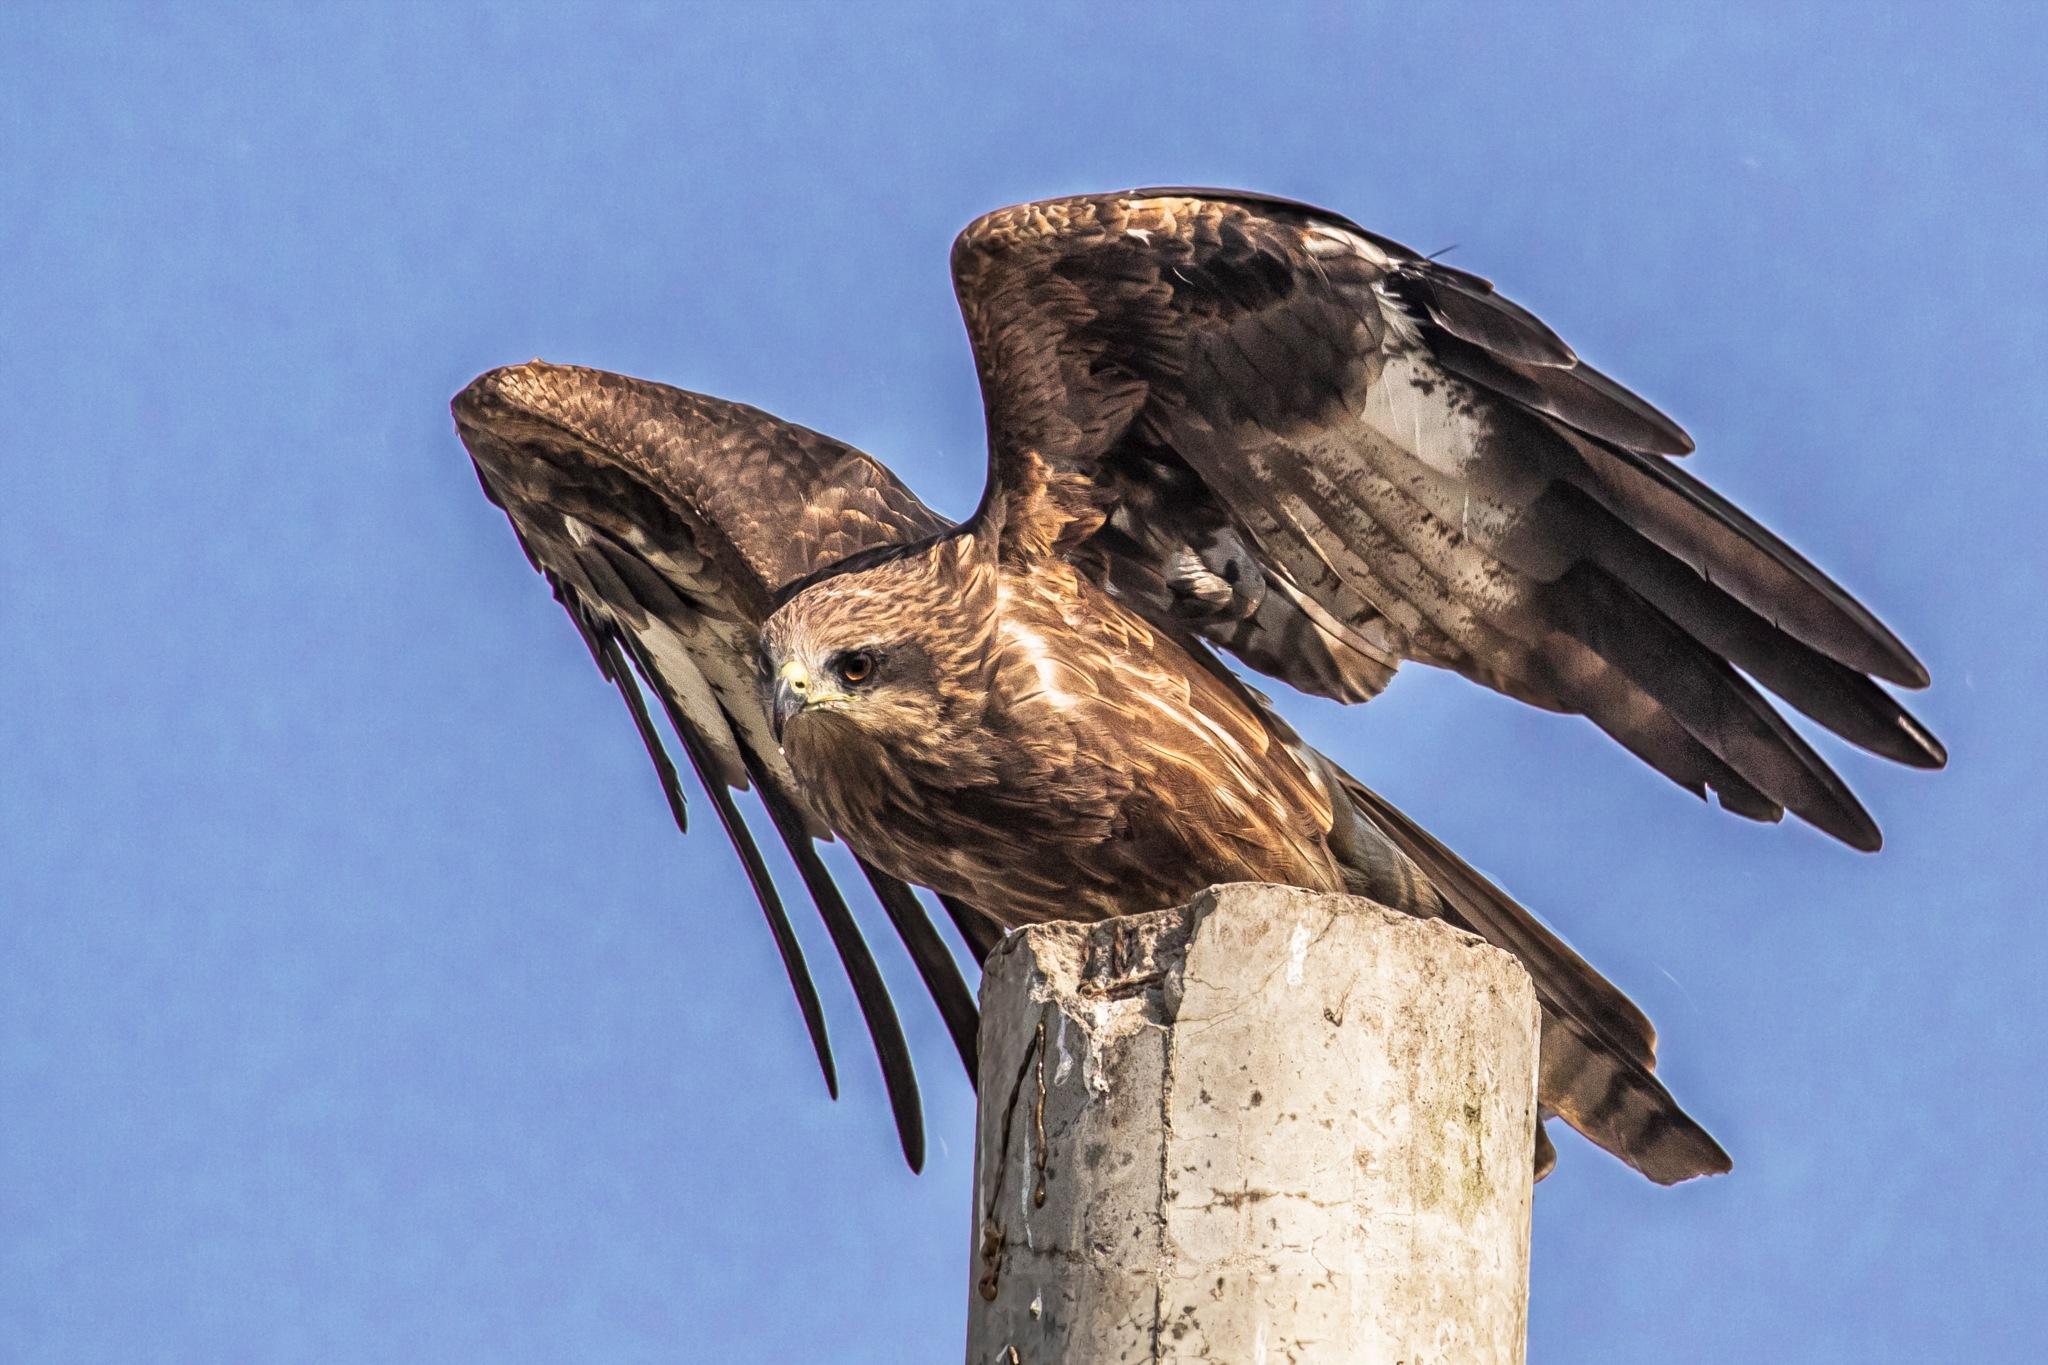 Black Kite ( ভূবন চিল ) by Arunkumar Banik